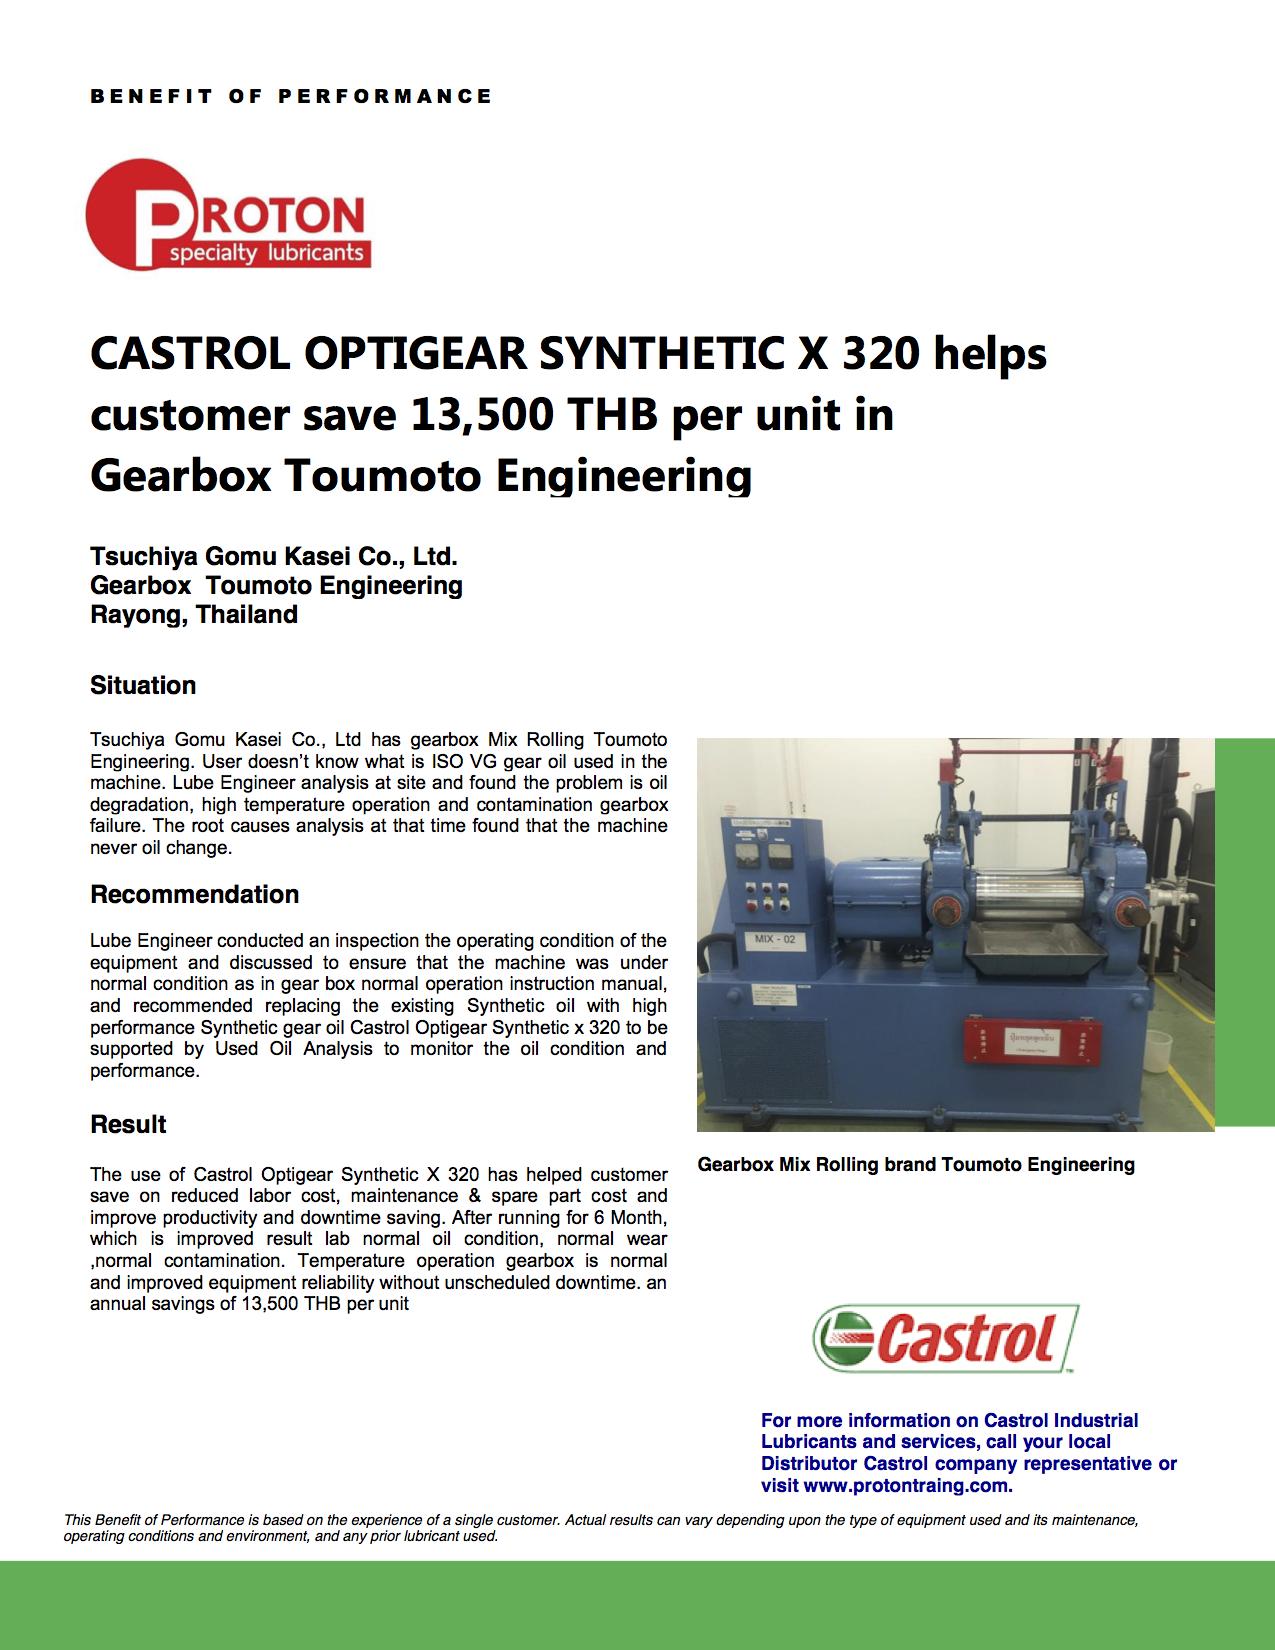 BOP_Castrol _Optigear Synthetic X 320 (TGK).png